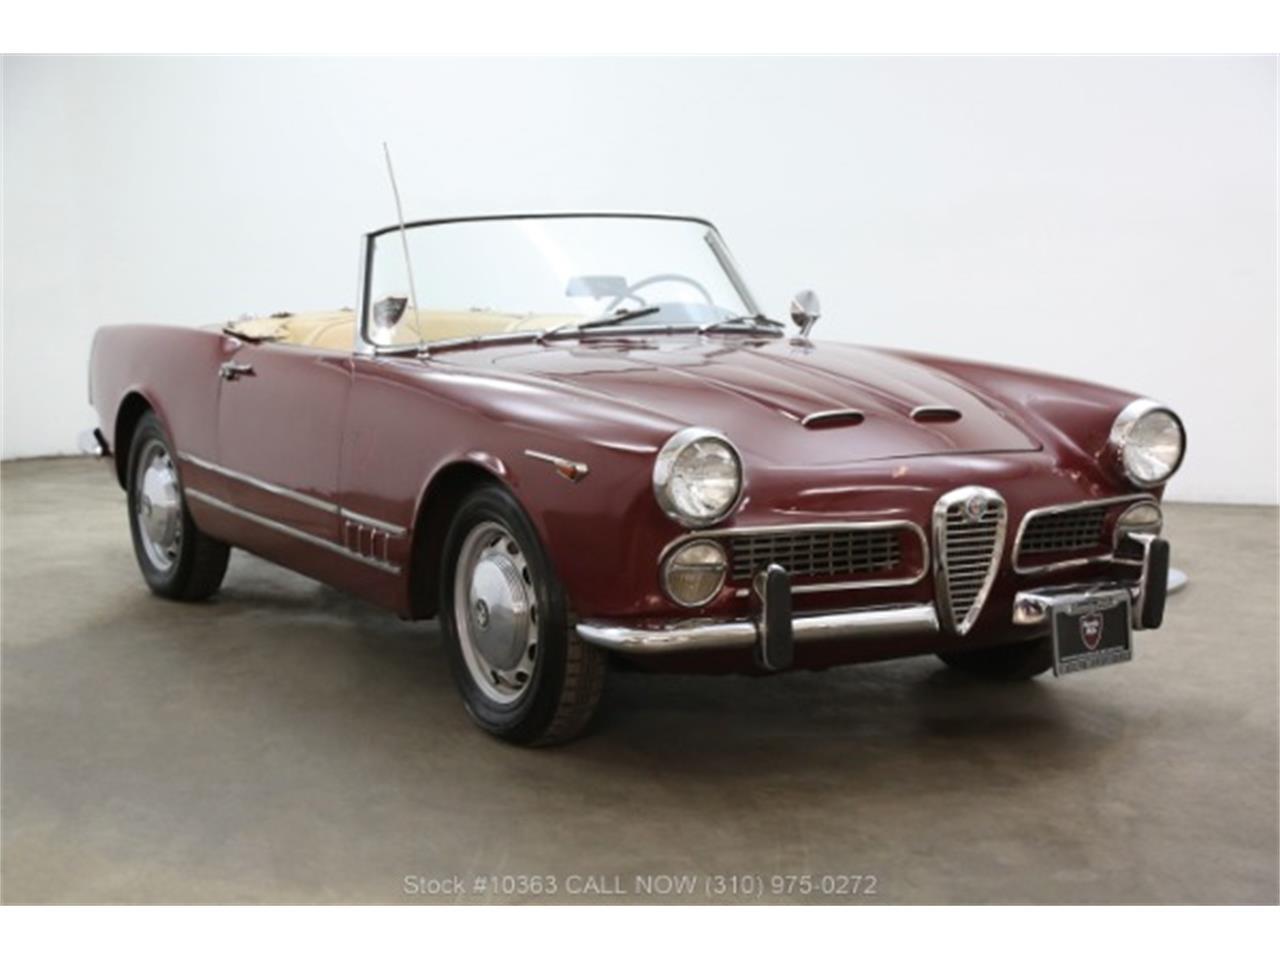 1962 alfa romeo spider for sale | classiccars | cc-1171092